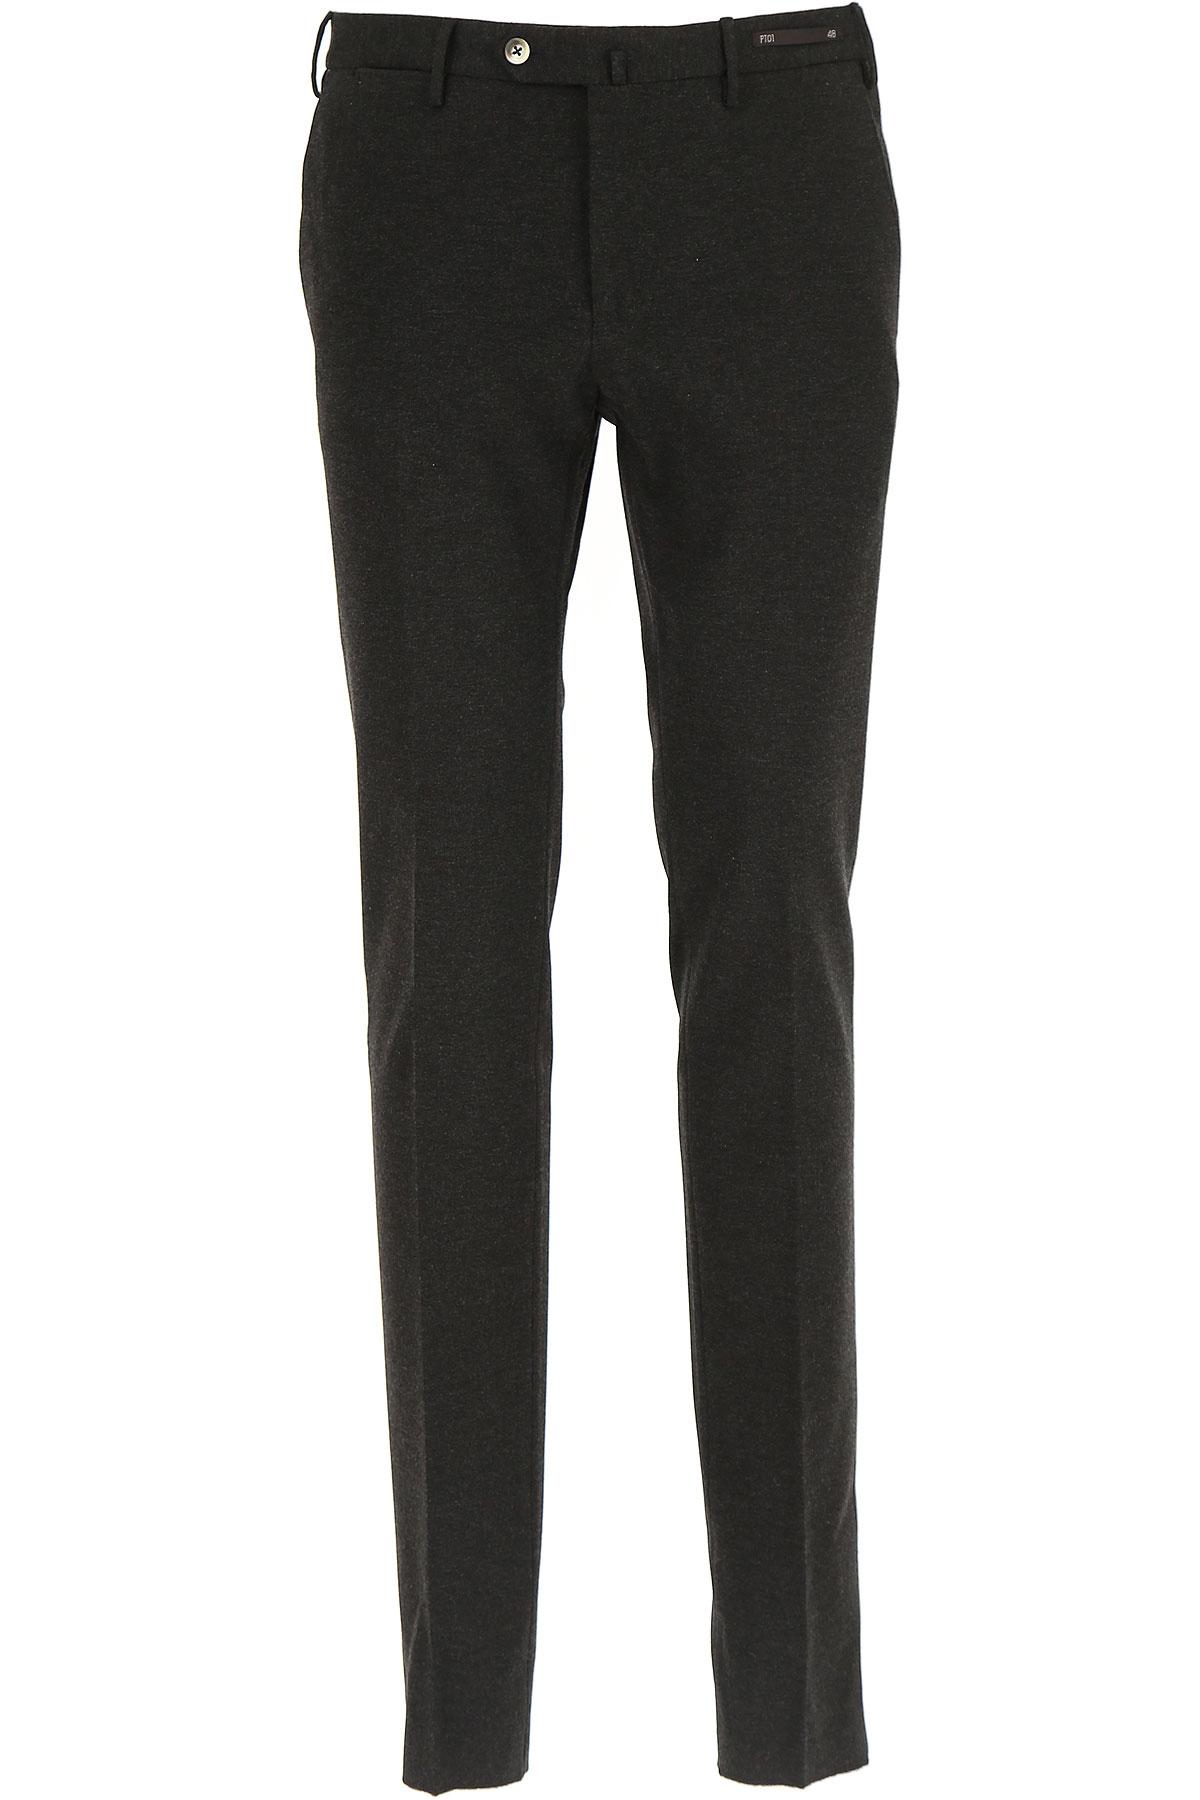 Image of PT01 Pants for Men, Anthracite Grey, Viscose, 2017, 28 30 32 34 36